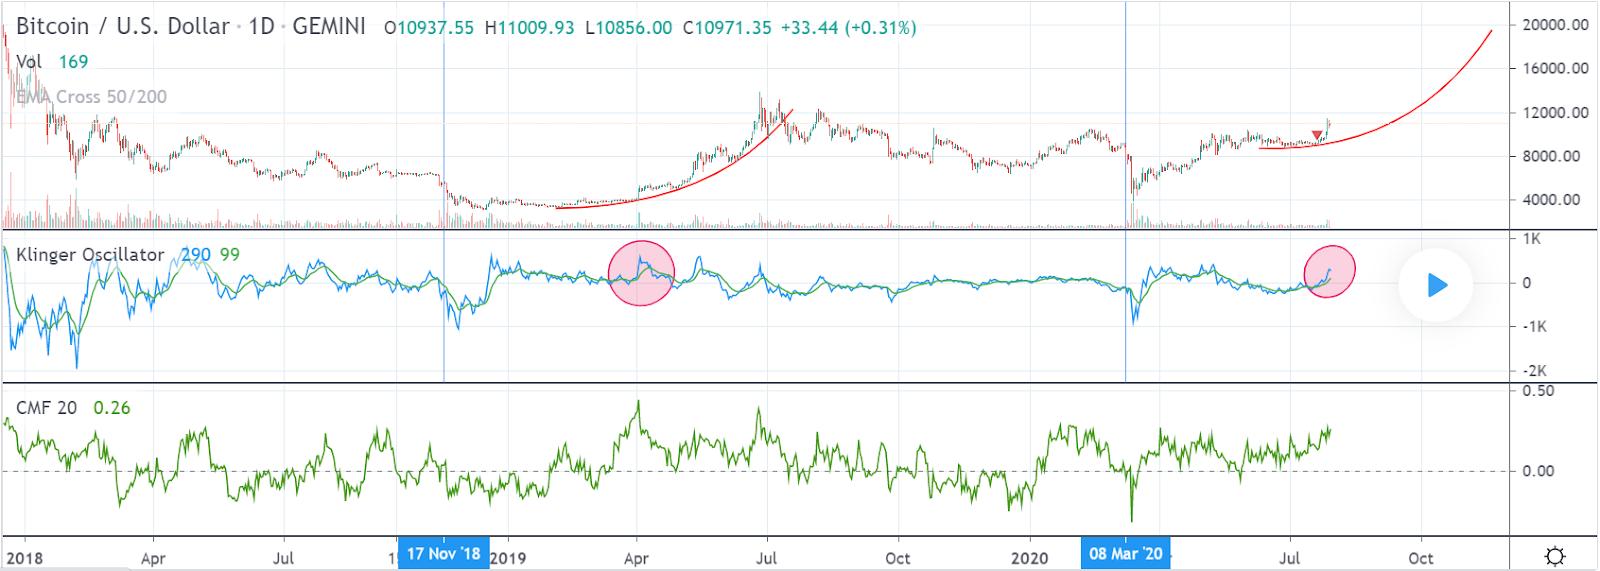 bitcoin price volume